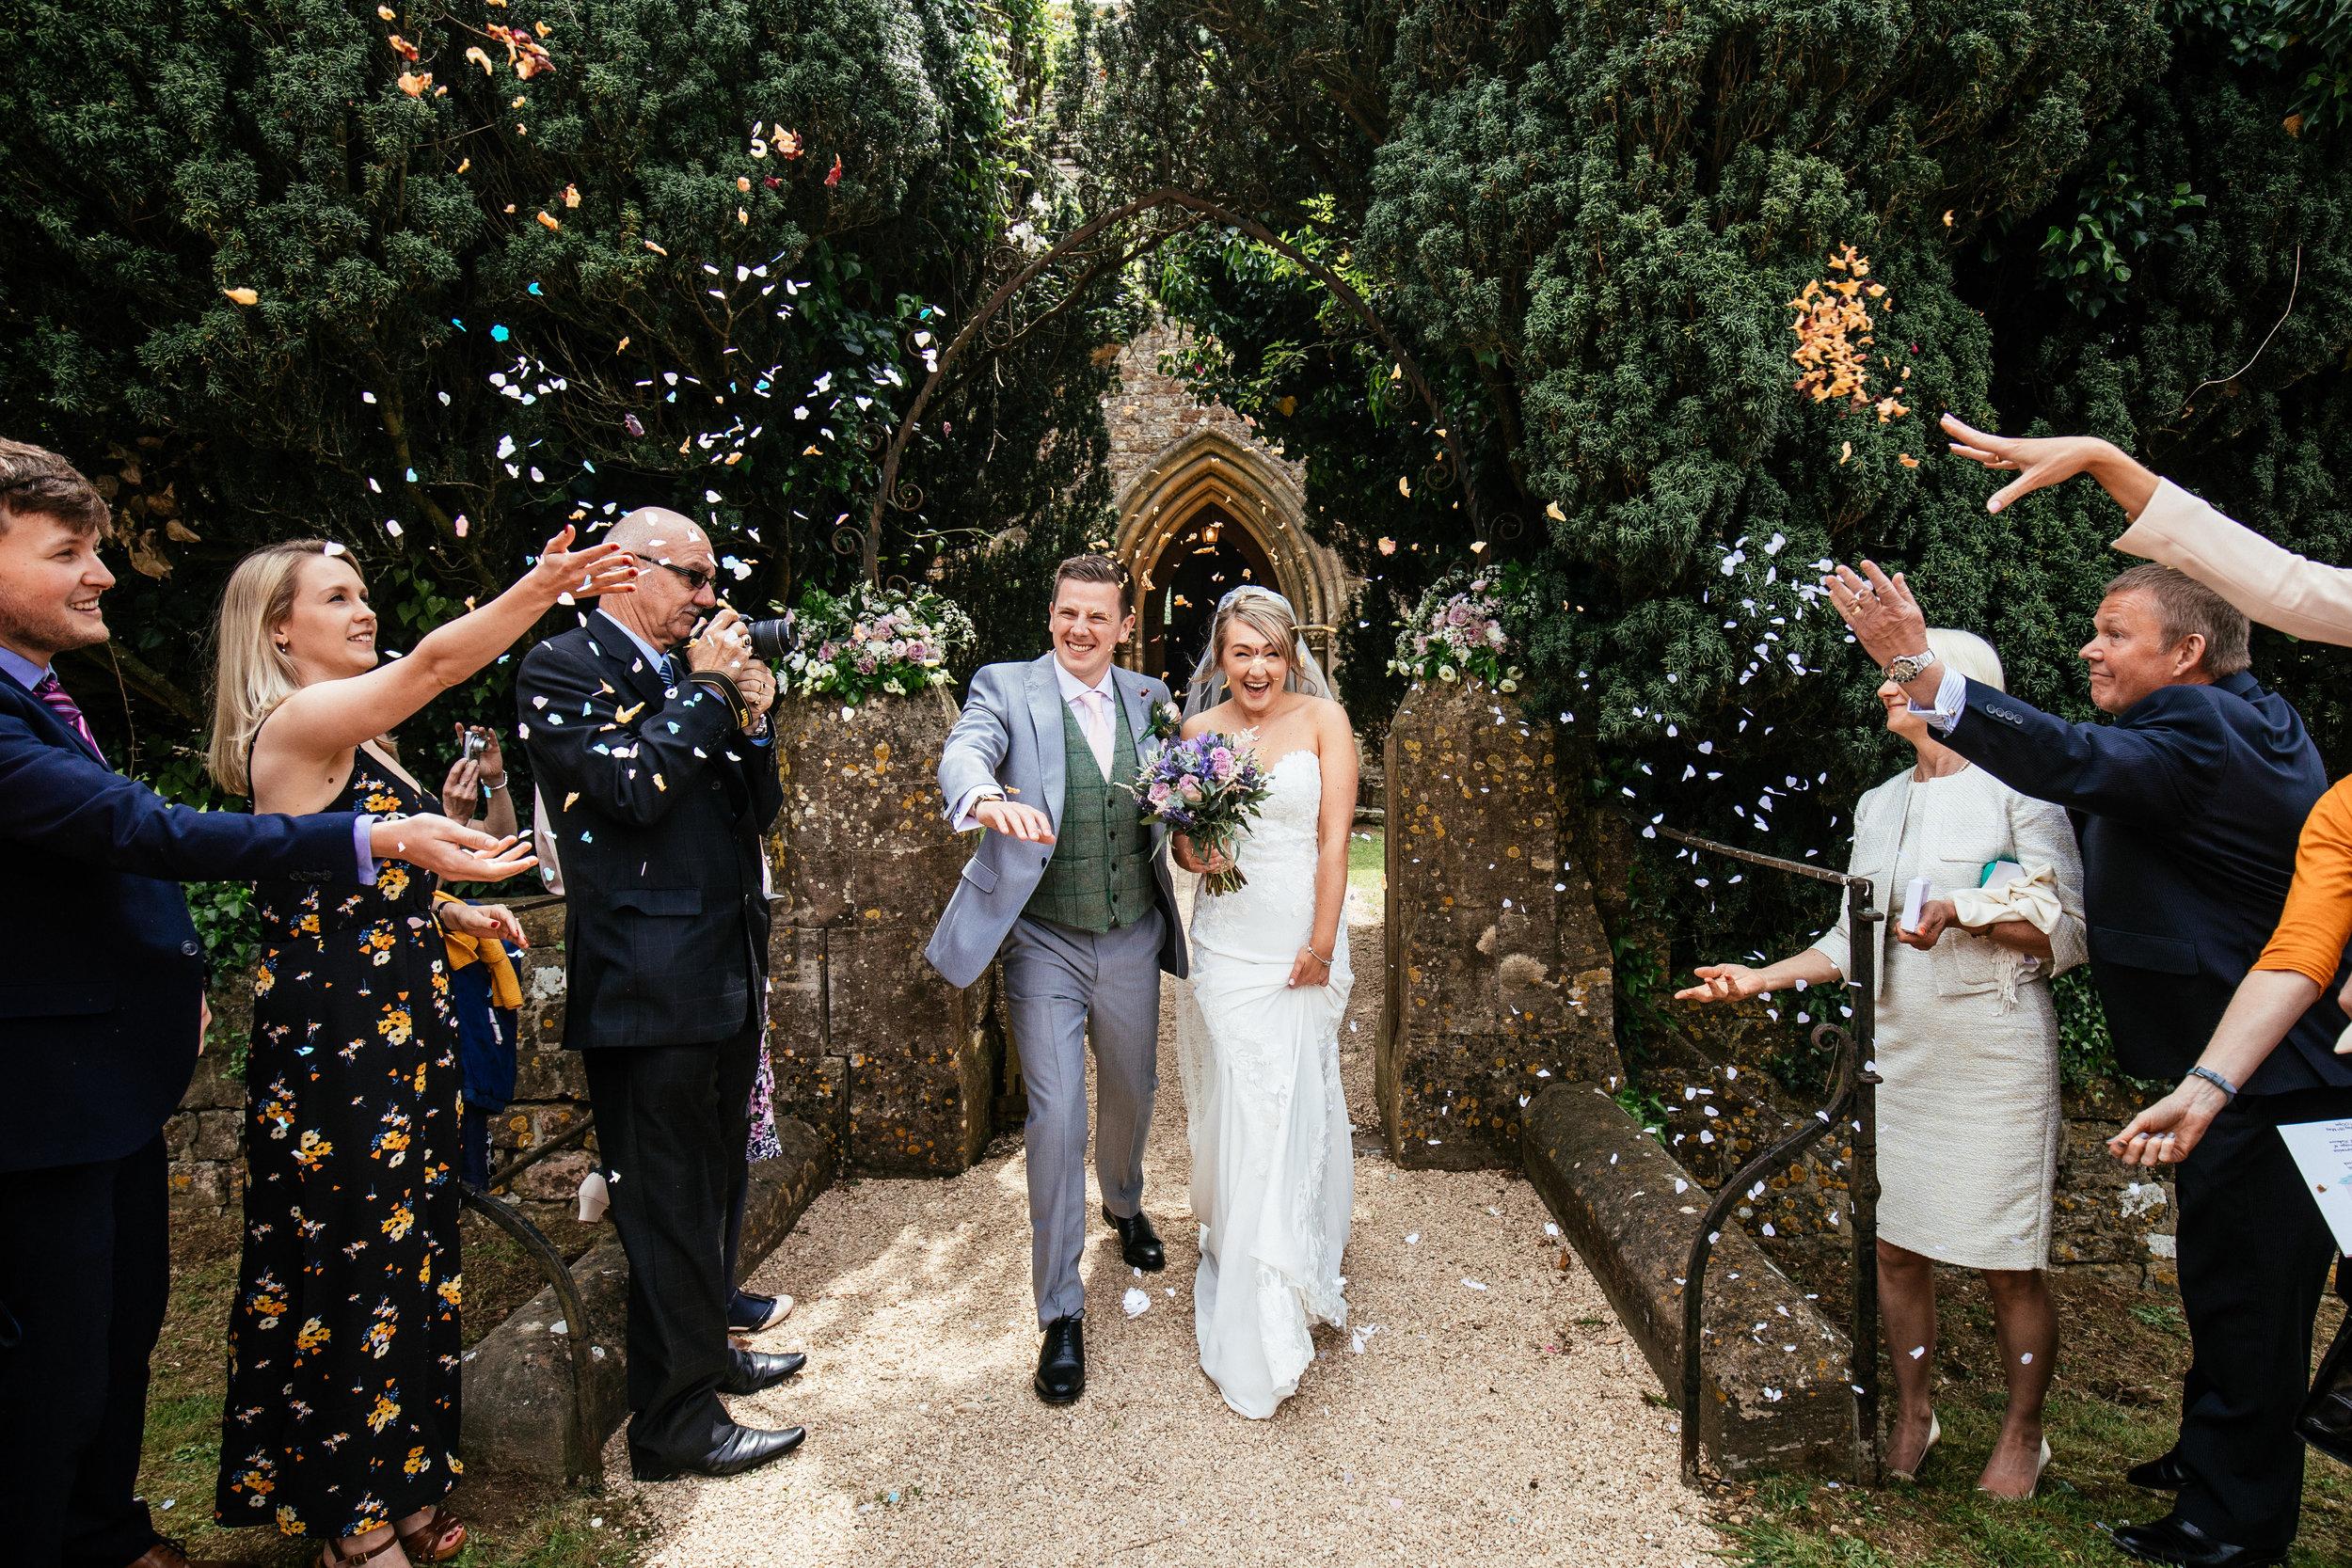 Becky-and-Sam-Wedding-Highlights-25.jpg